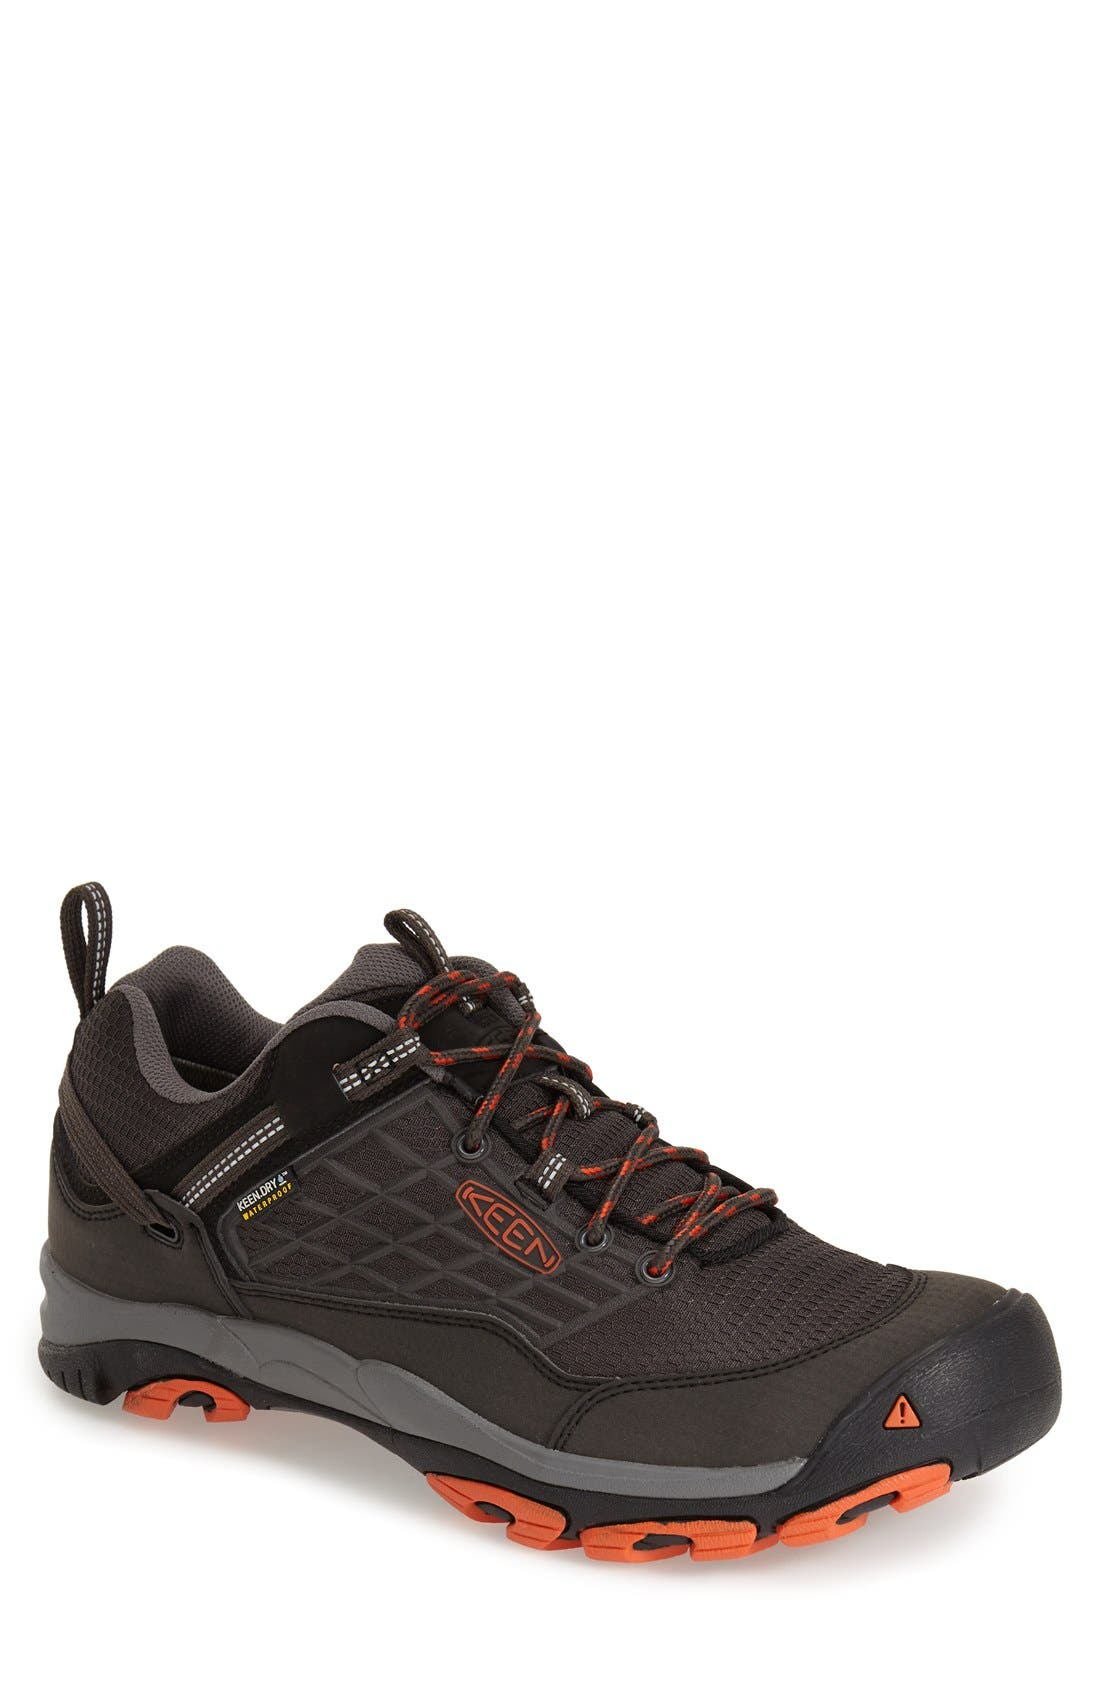 'Saltzman' Waterproof Walking Shoe,                         Main,                         color, RAVEN/ KOI